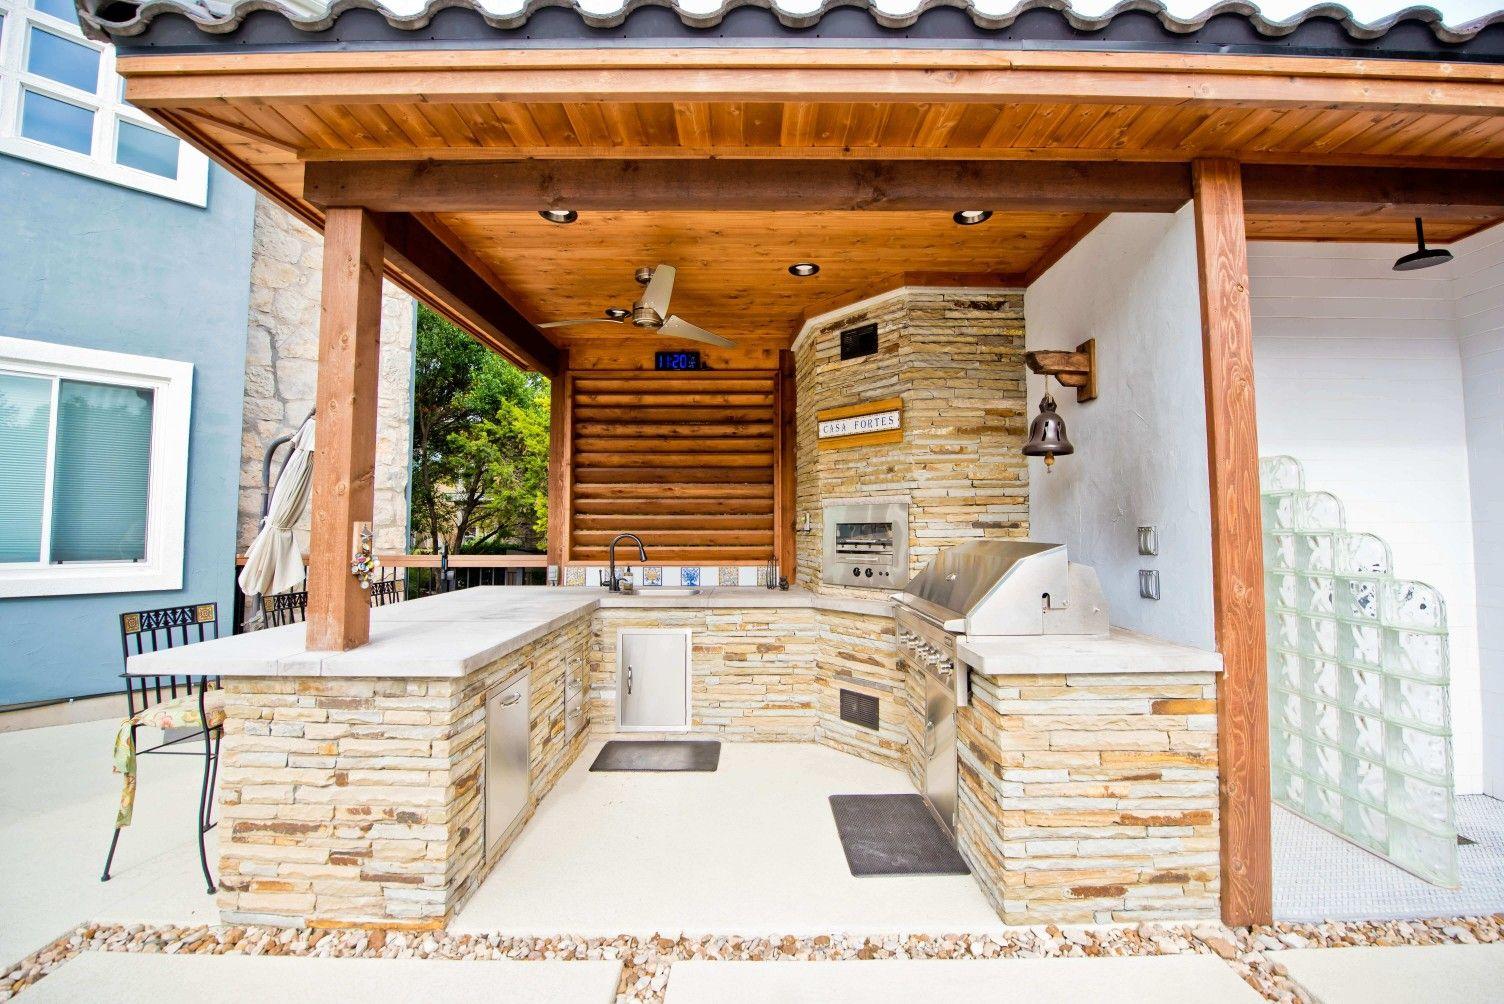 Austin Outdoor Living Photos Outdoor Kitchens Fireplaces San Antonio Custom Outdoor Kitchen Outdoor Living Patio Outdoor Living Areas